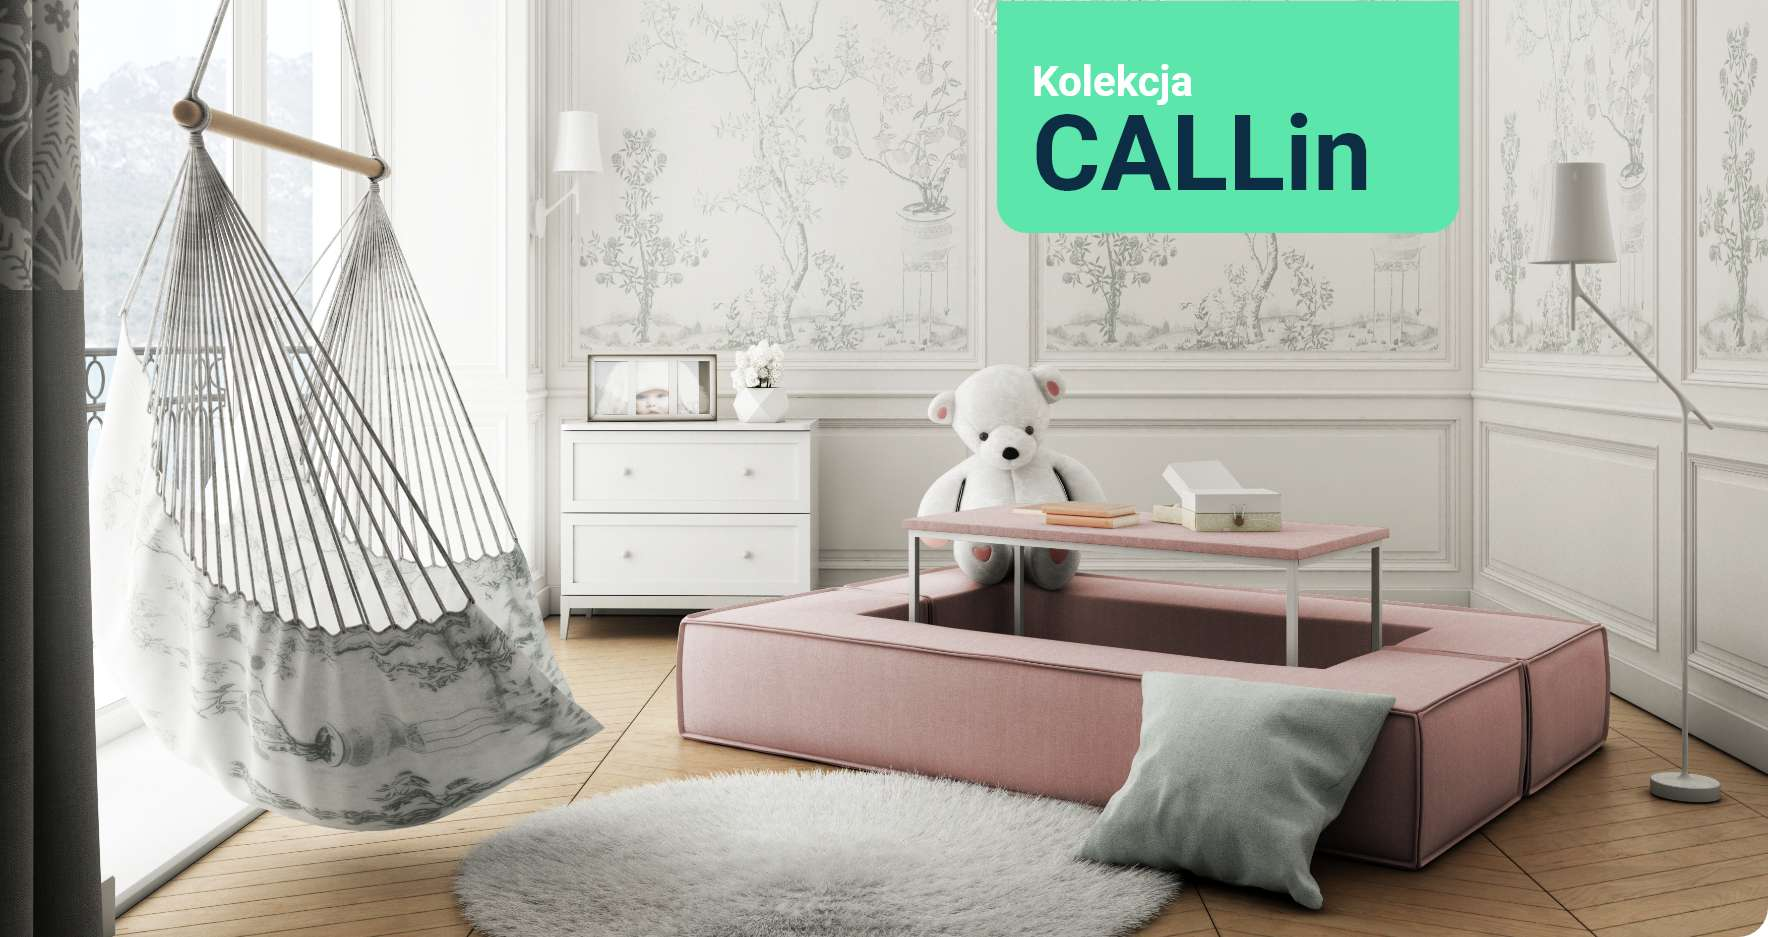 Banner - Kolekcja CALLin